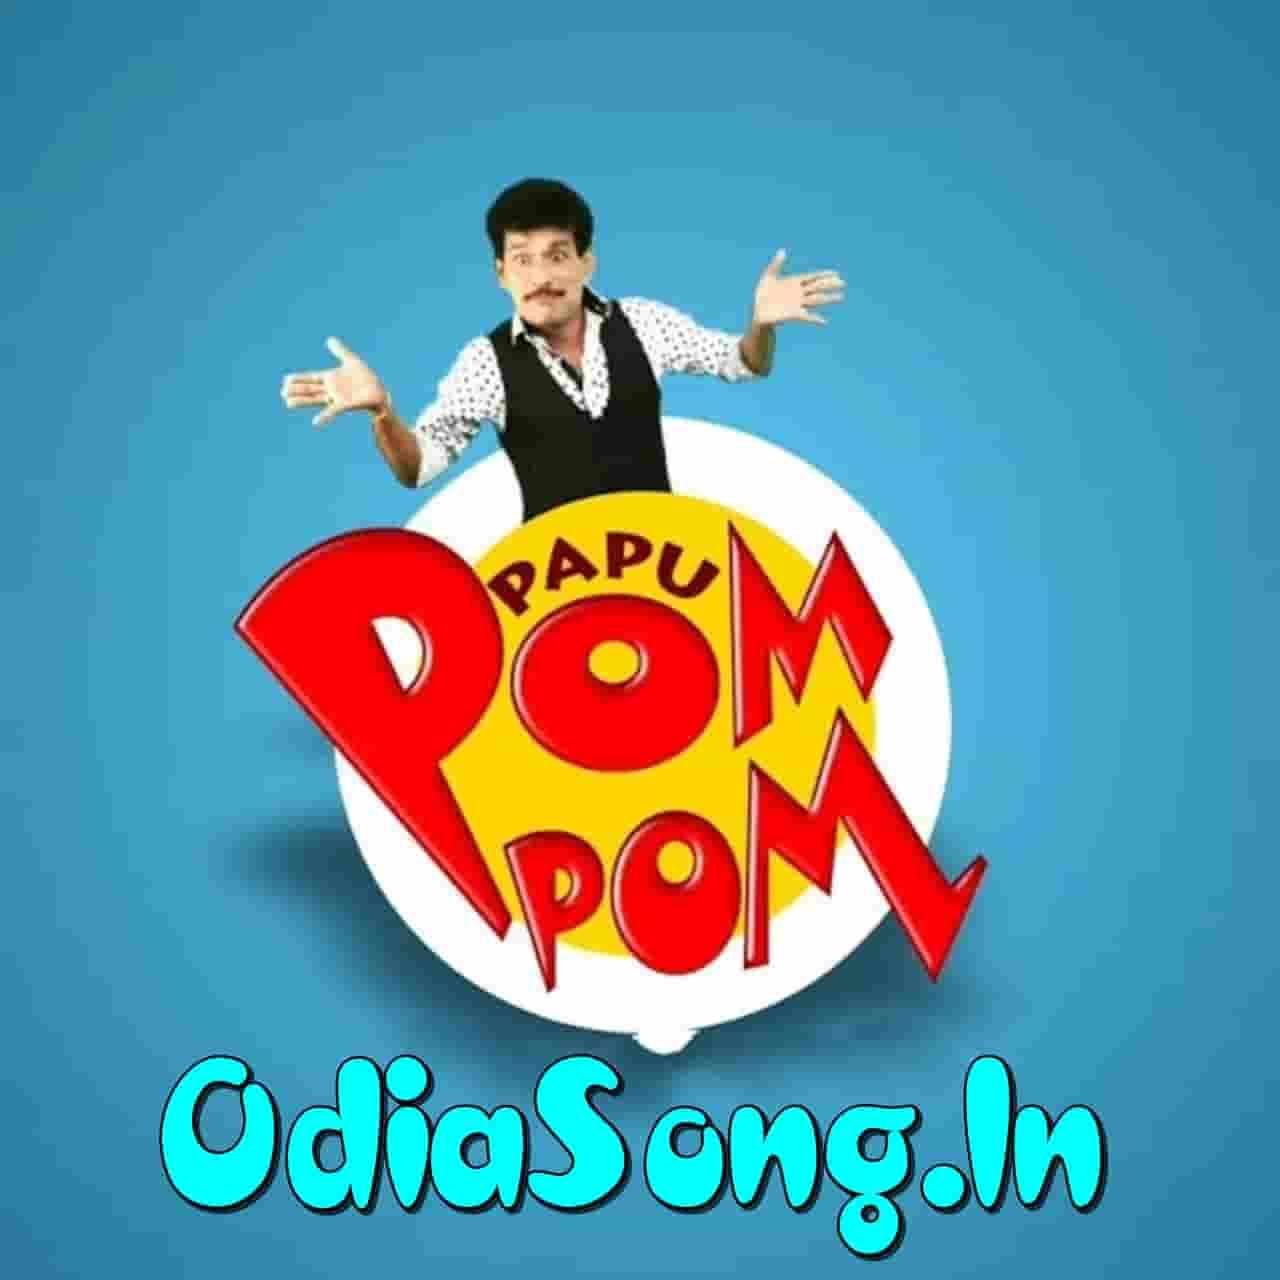 Sunpampudi - Papu Pom Pom, Iswri - Odia Funny Song